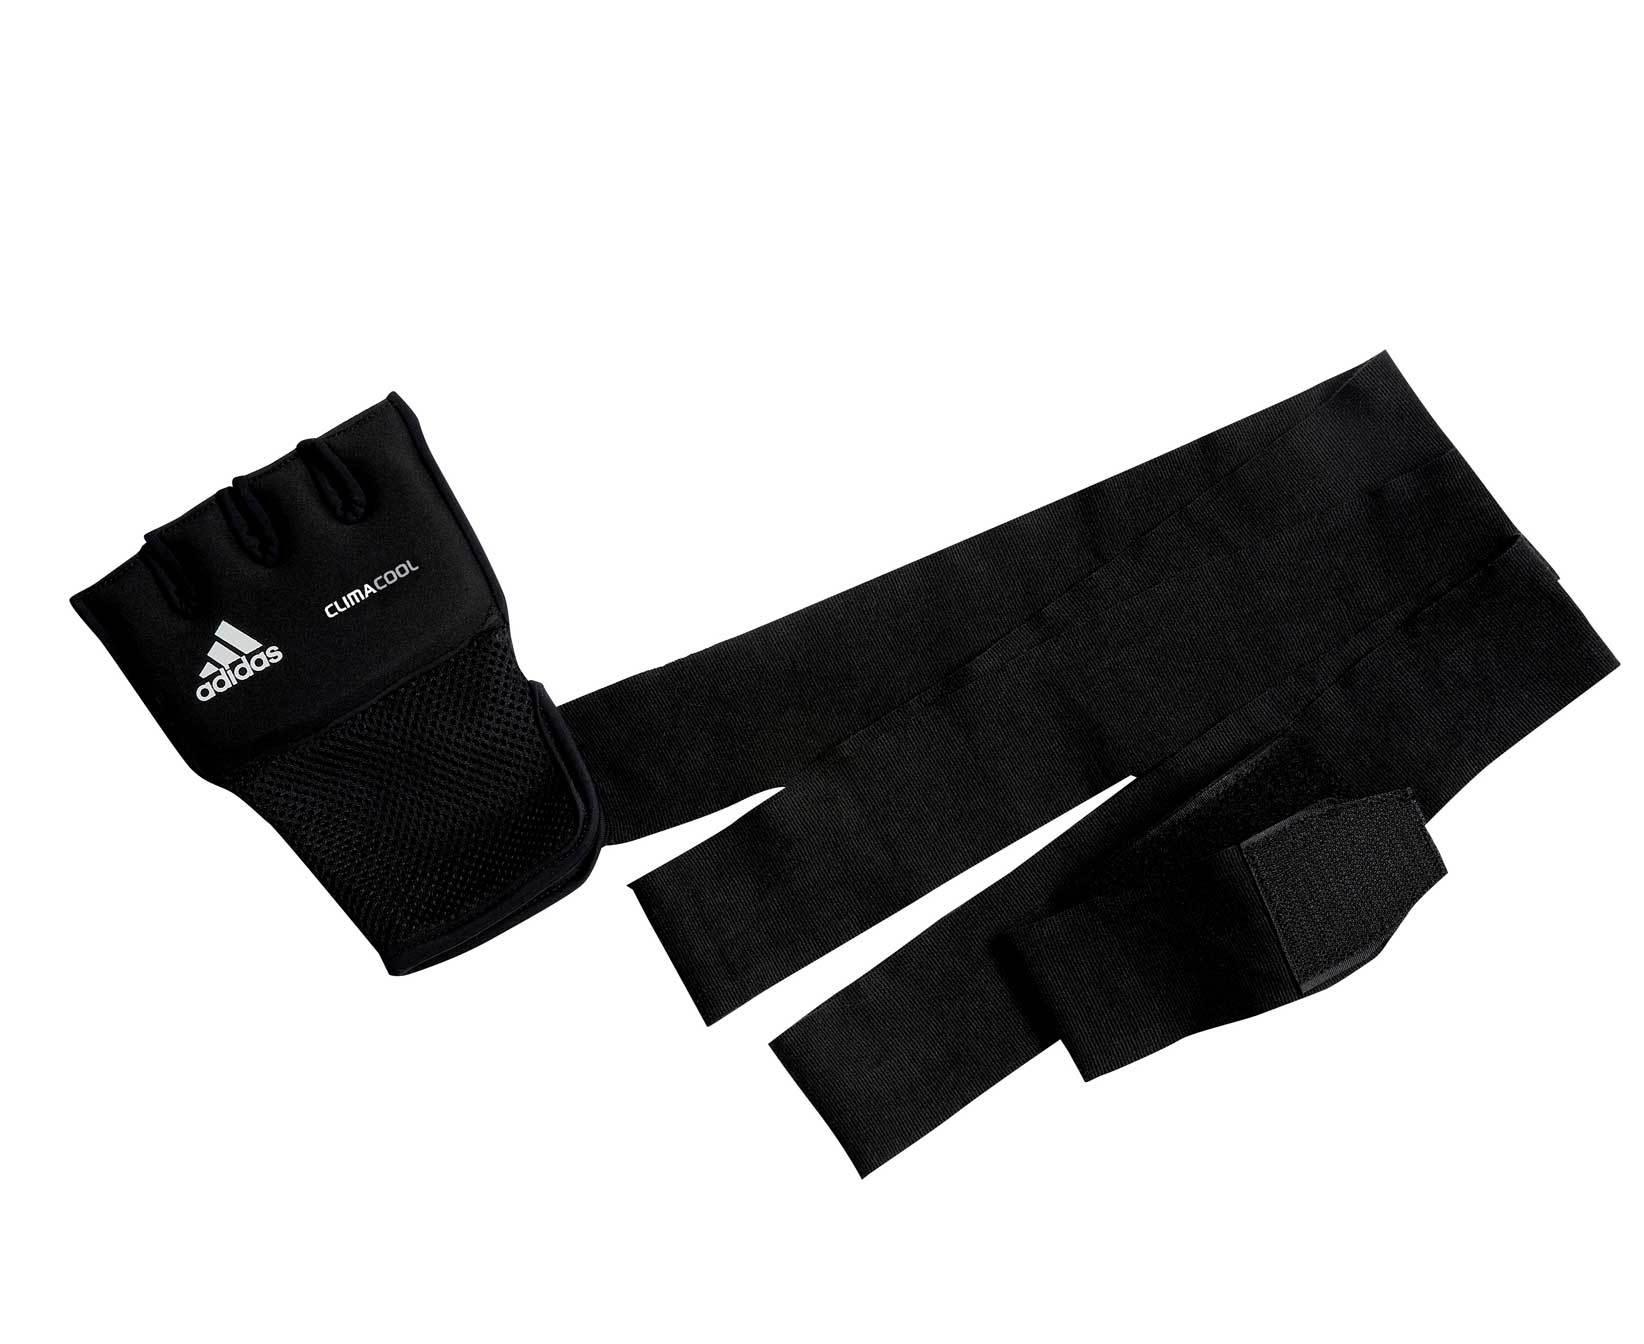 Снарядные перчатки НАКЛАДКИ ГЕЛЕВЫЕ ADIDAS С БИНТОМ 2 МЕТРА nakladki_gelevye_s_bintom_2_metra_quick_wrap_glove_mexican_chernye_pic1.jpg